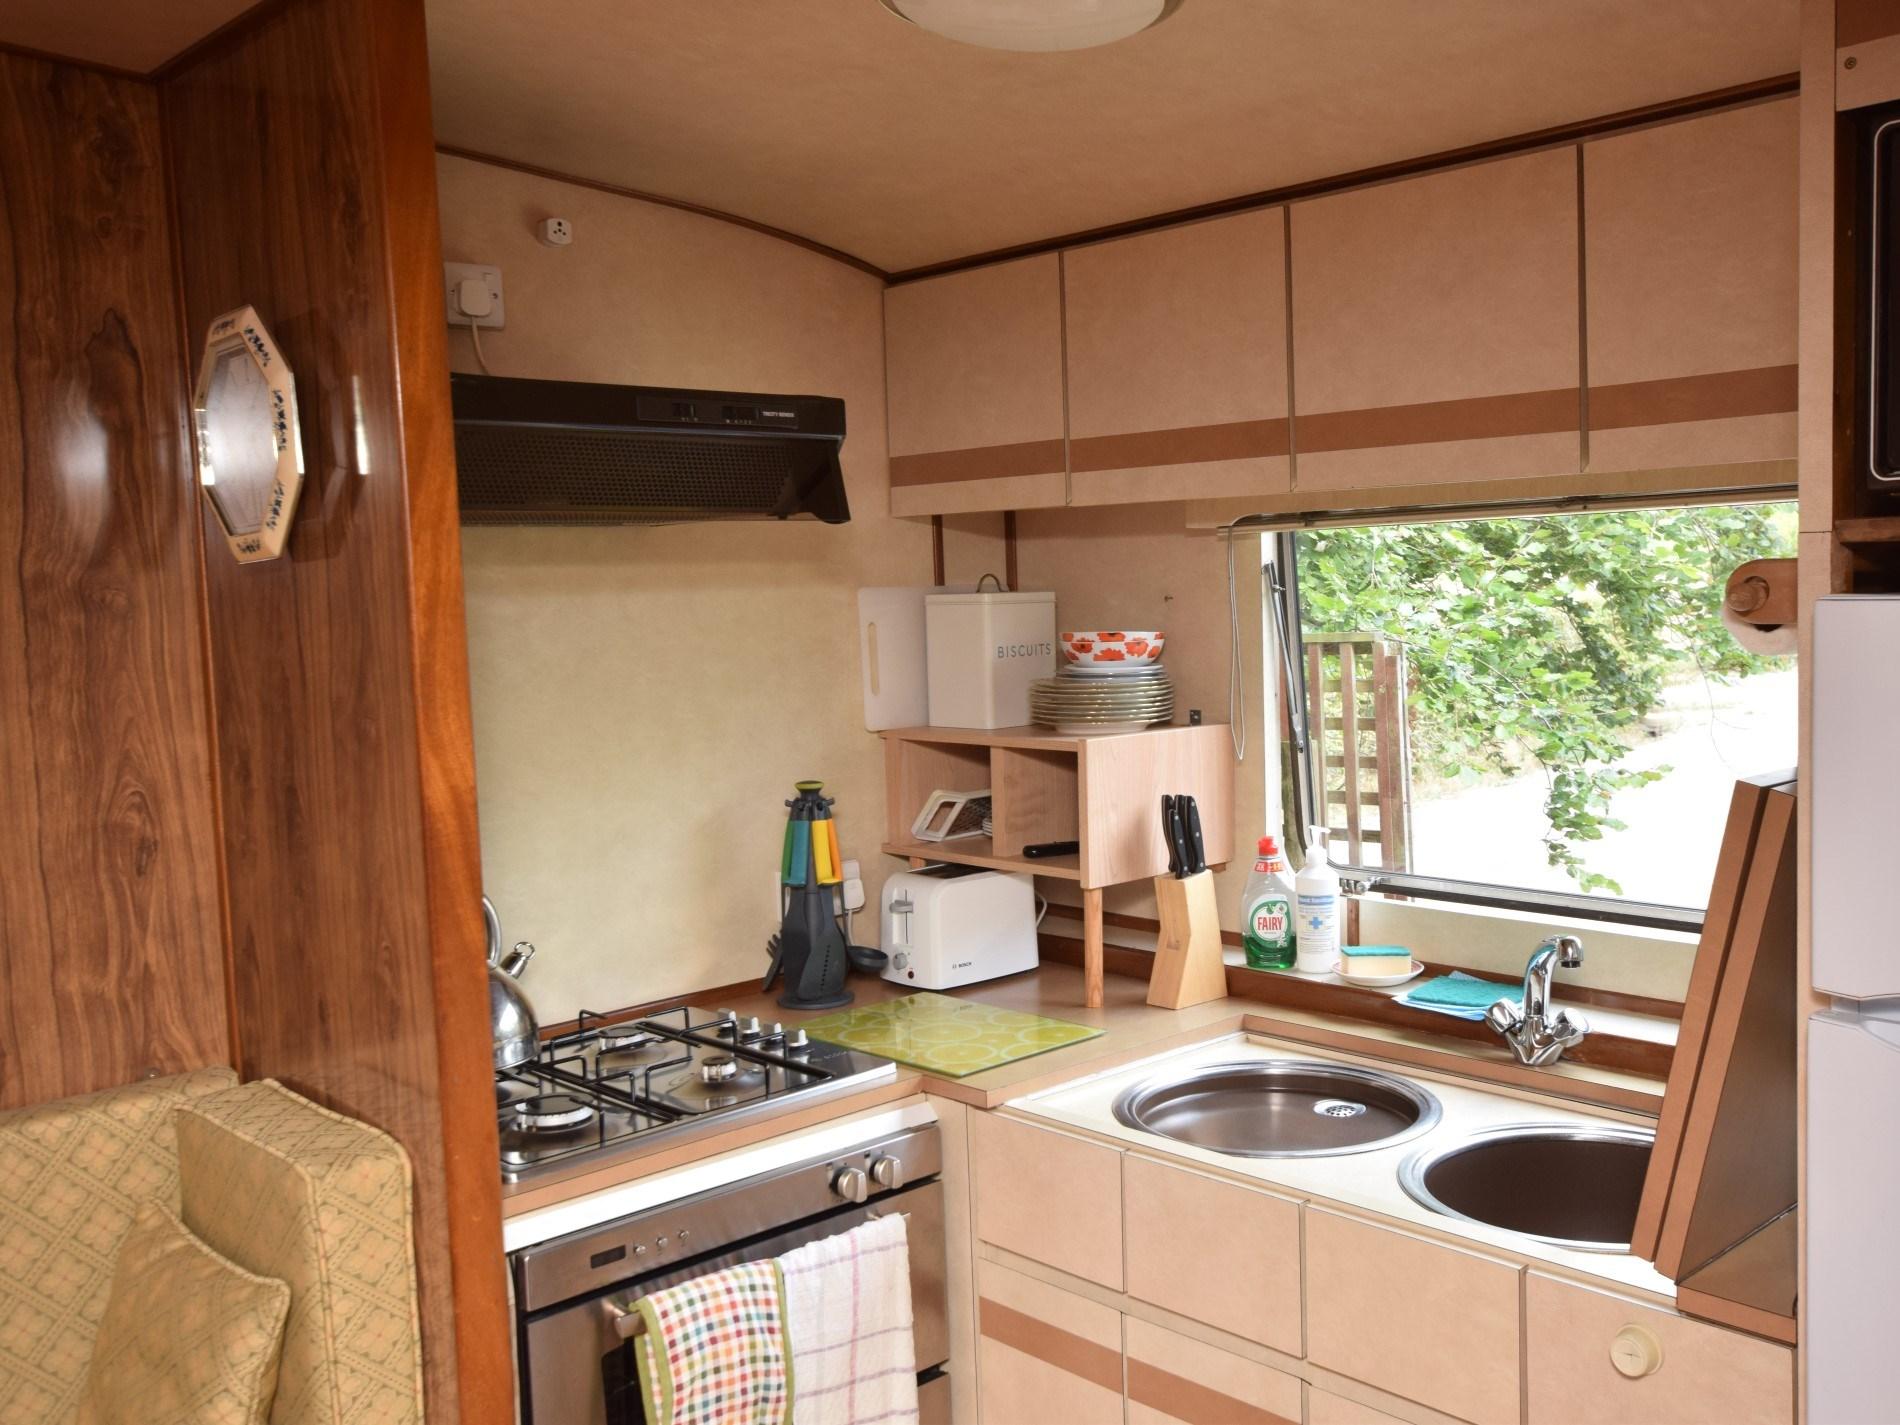 1 Bedroom Cottage in Robertsbridge, South of England